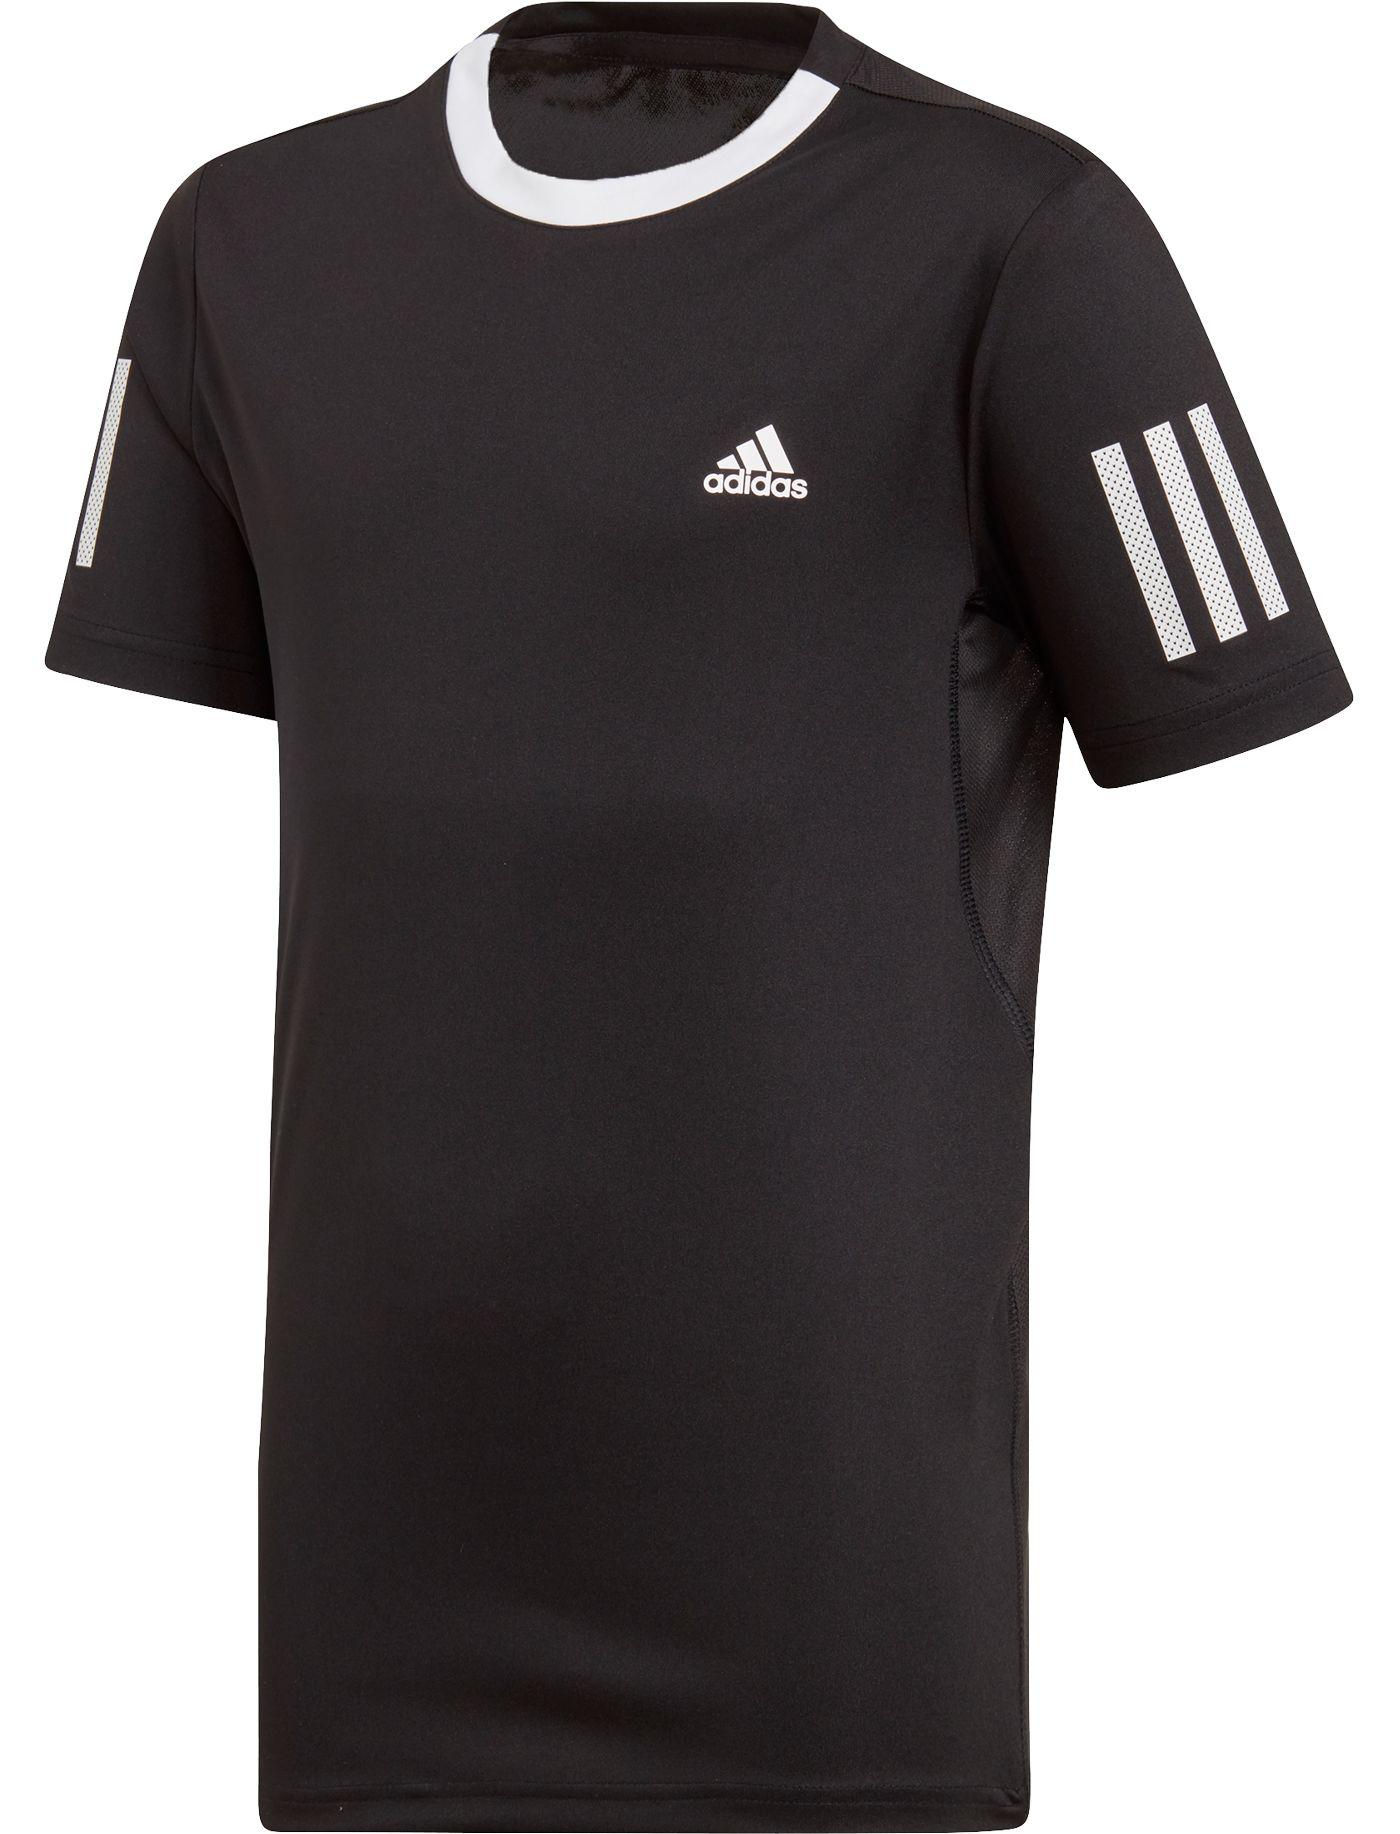 adidas Boys' Club 3-Stripes Tennis Tee